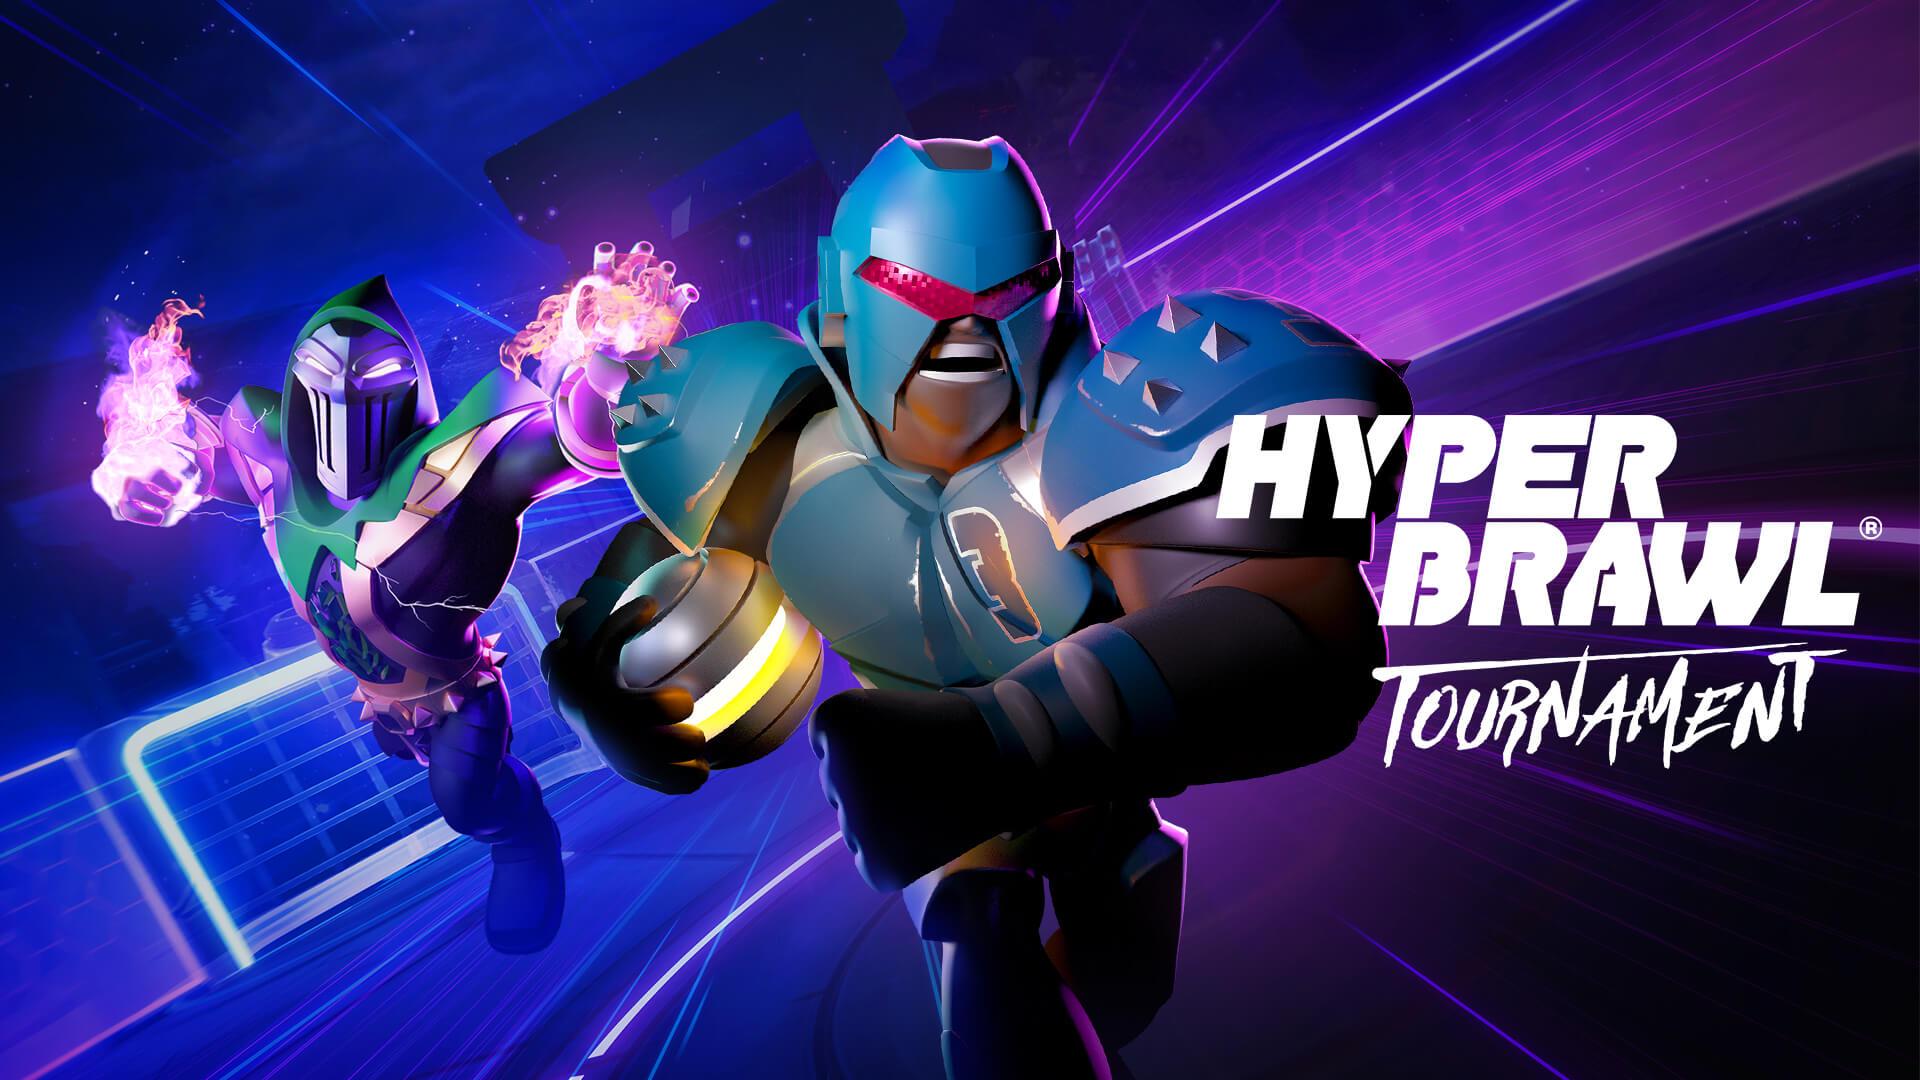 HyperBrawl Tournament Free PC Download